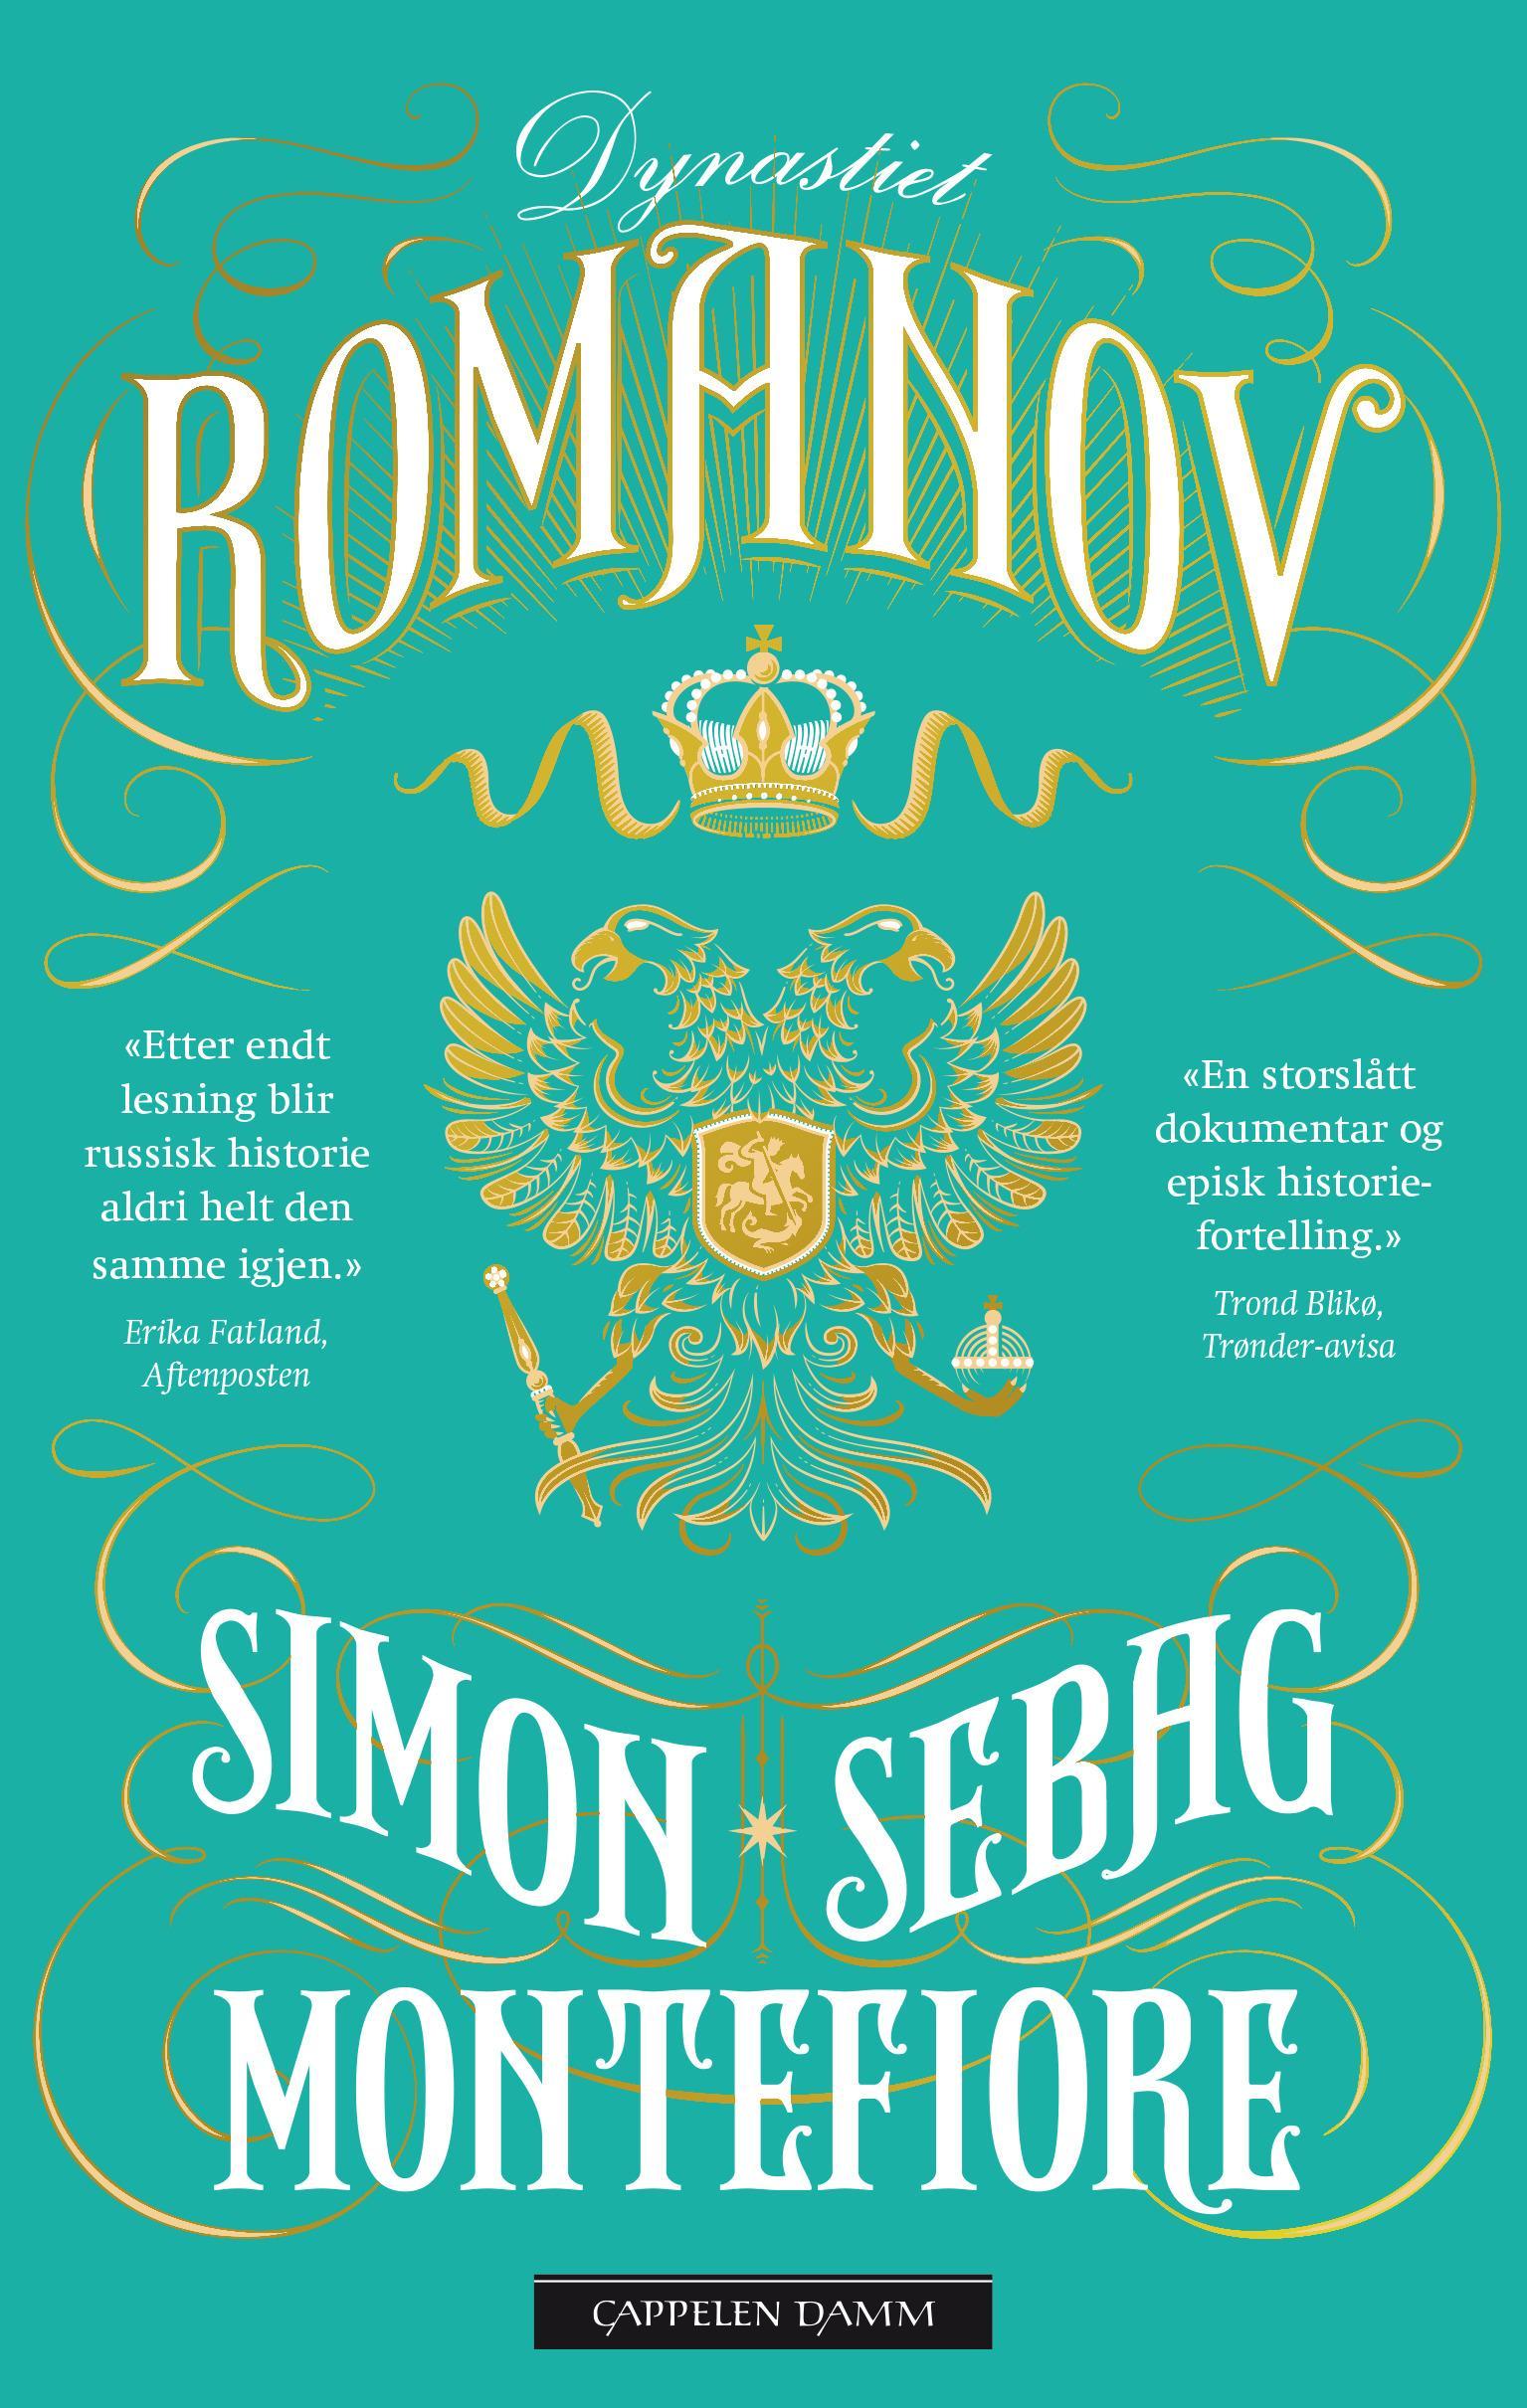 """Dynastiet Romanov - 1613-1918"" av Simon Sebag Montefiore"